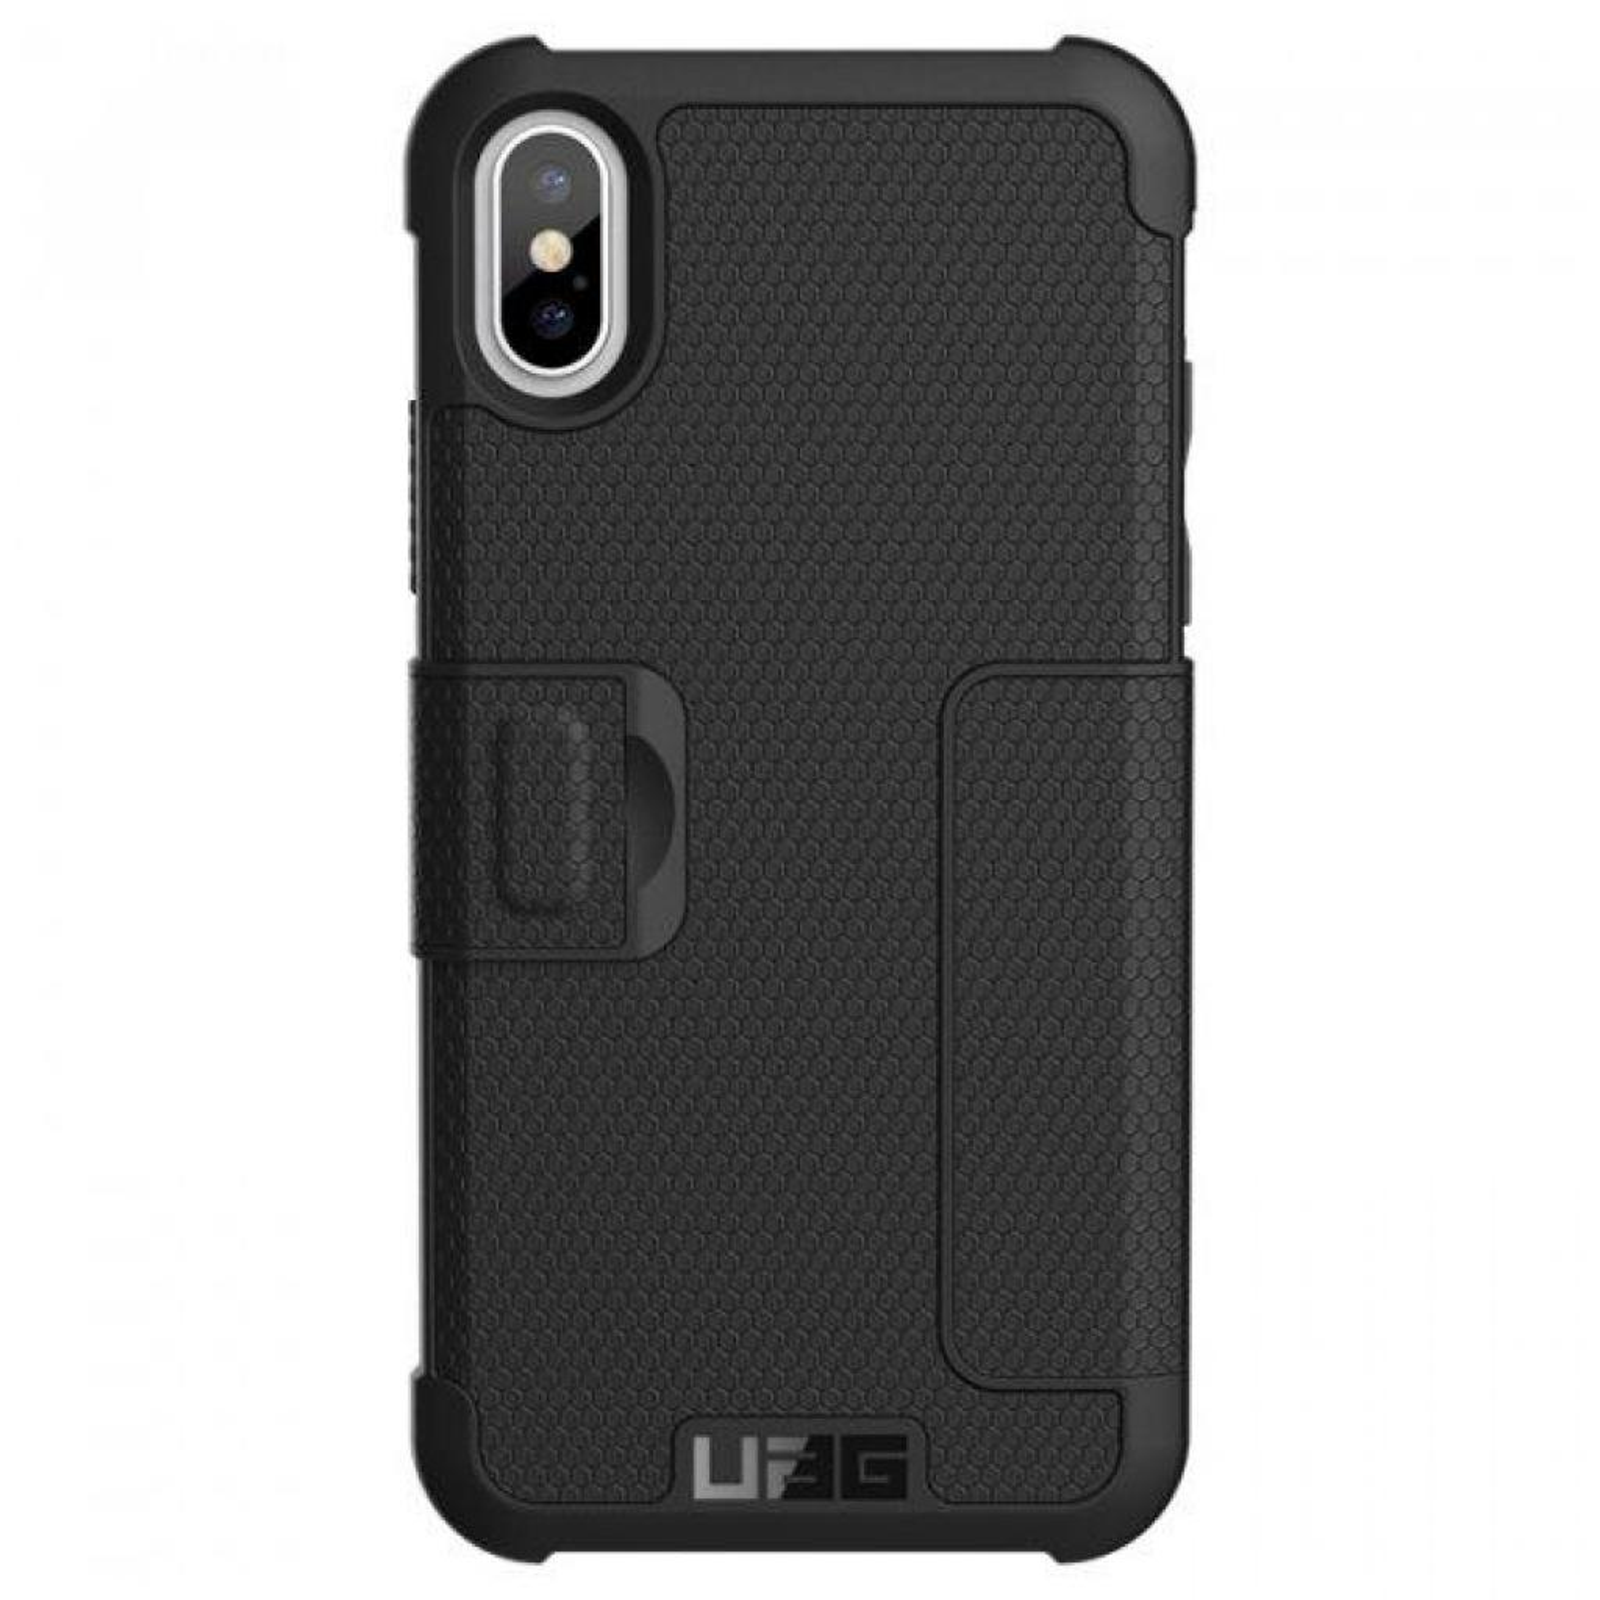 Чехол для моб. телефона Urban Armor Gear iPhone X Metropolis Black (IPHX-E-BL)